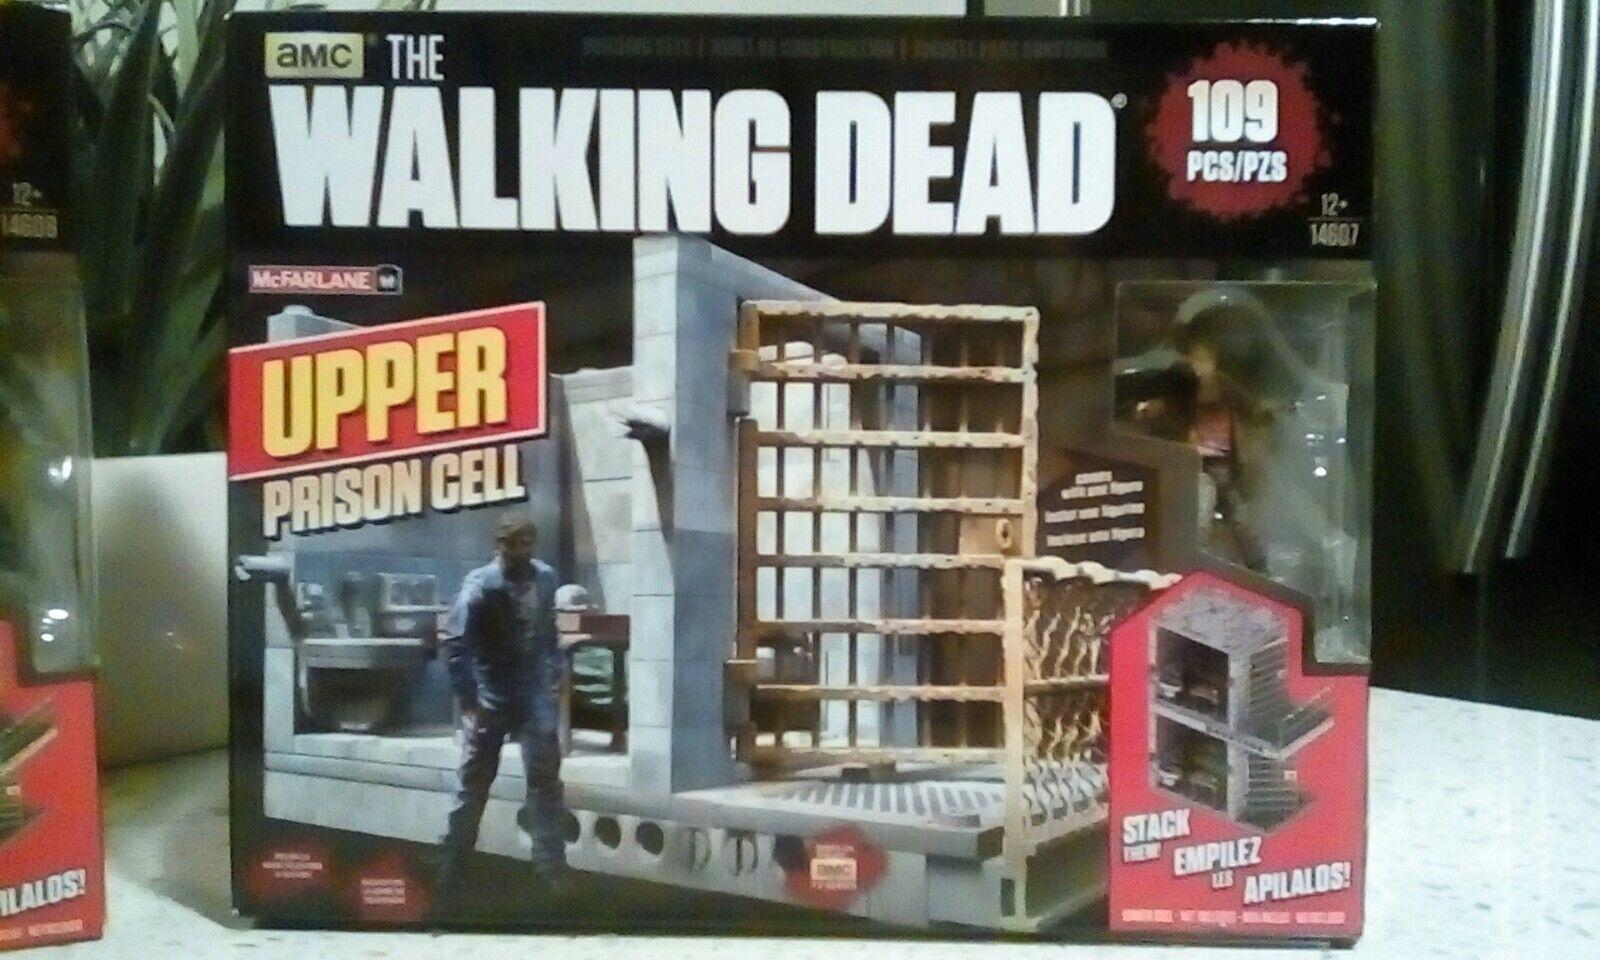 AMC McFarlane The Walking Dead Building Sets Upper Cell Lot of 2 Sets